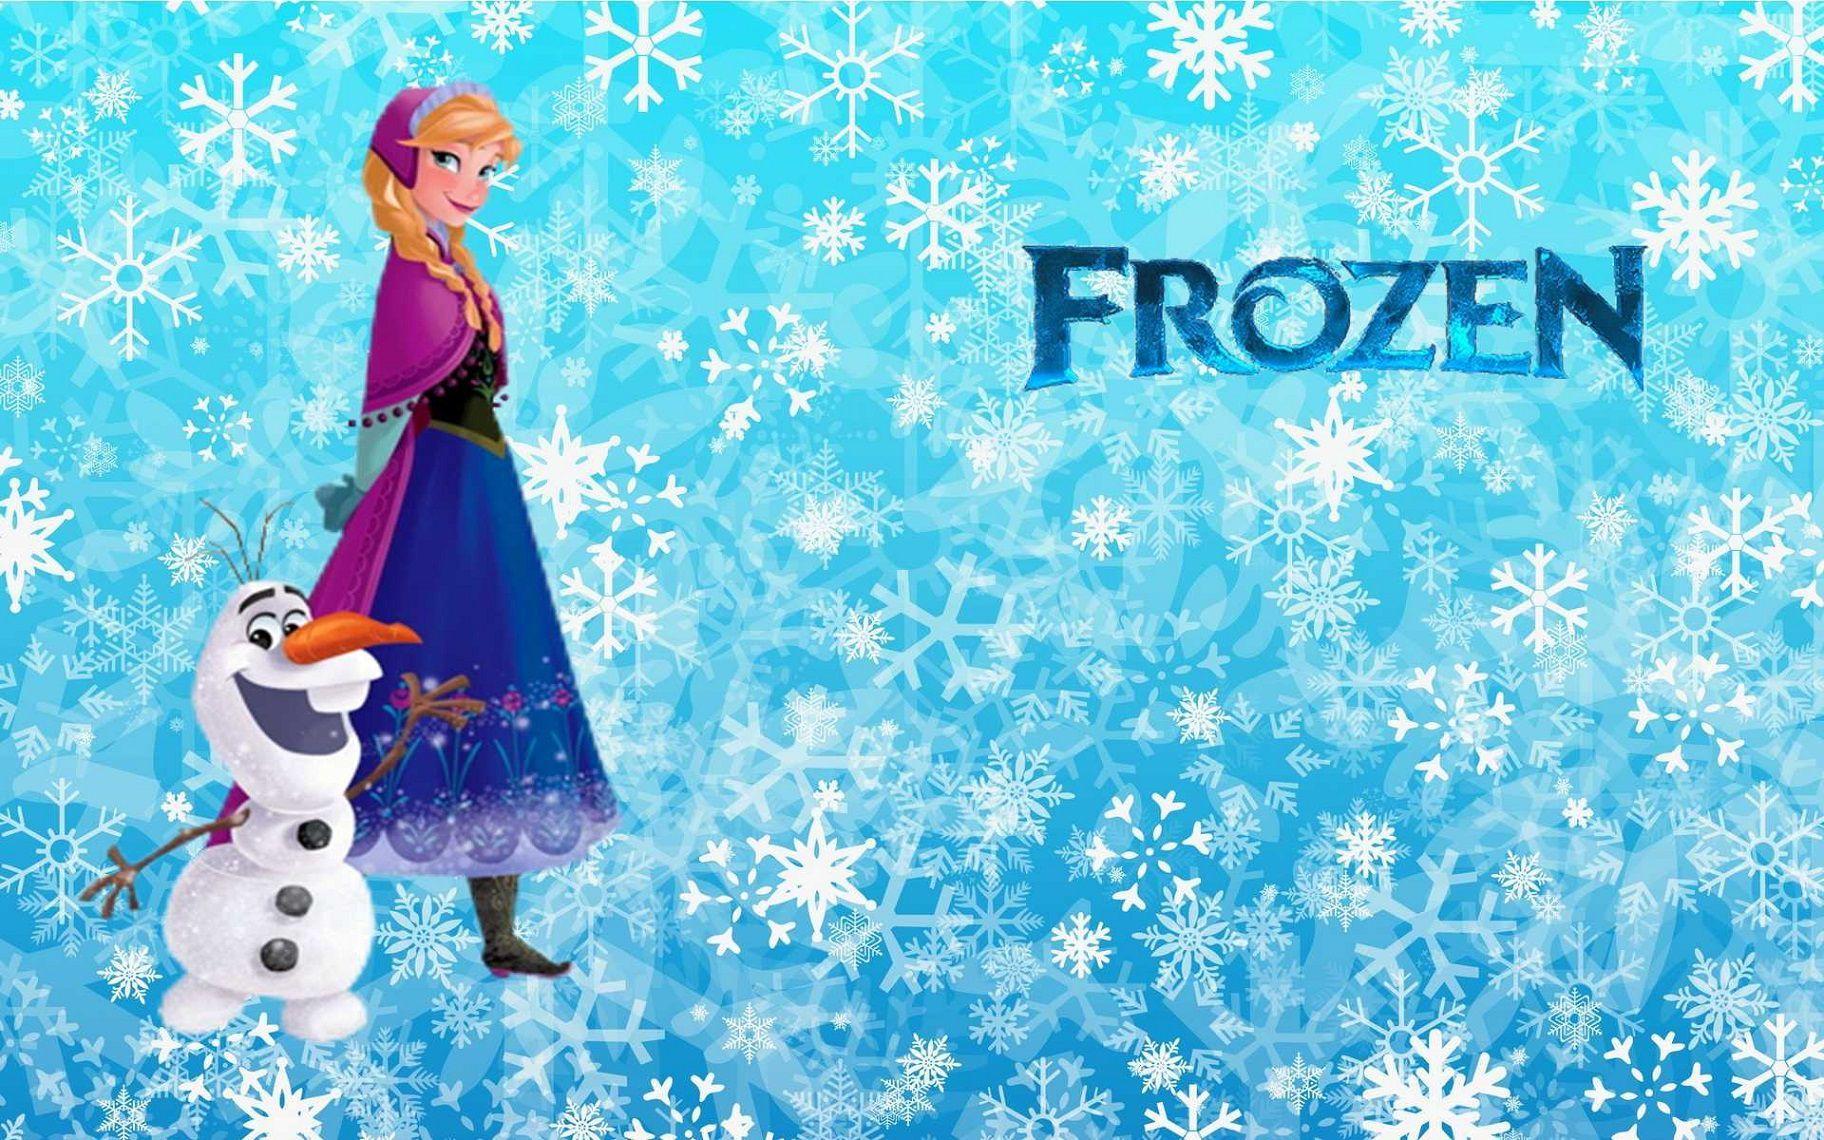 hd disney frozen wallpapers for mobile phone 1920×1200 frozen